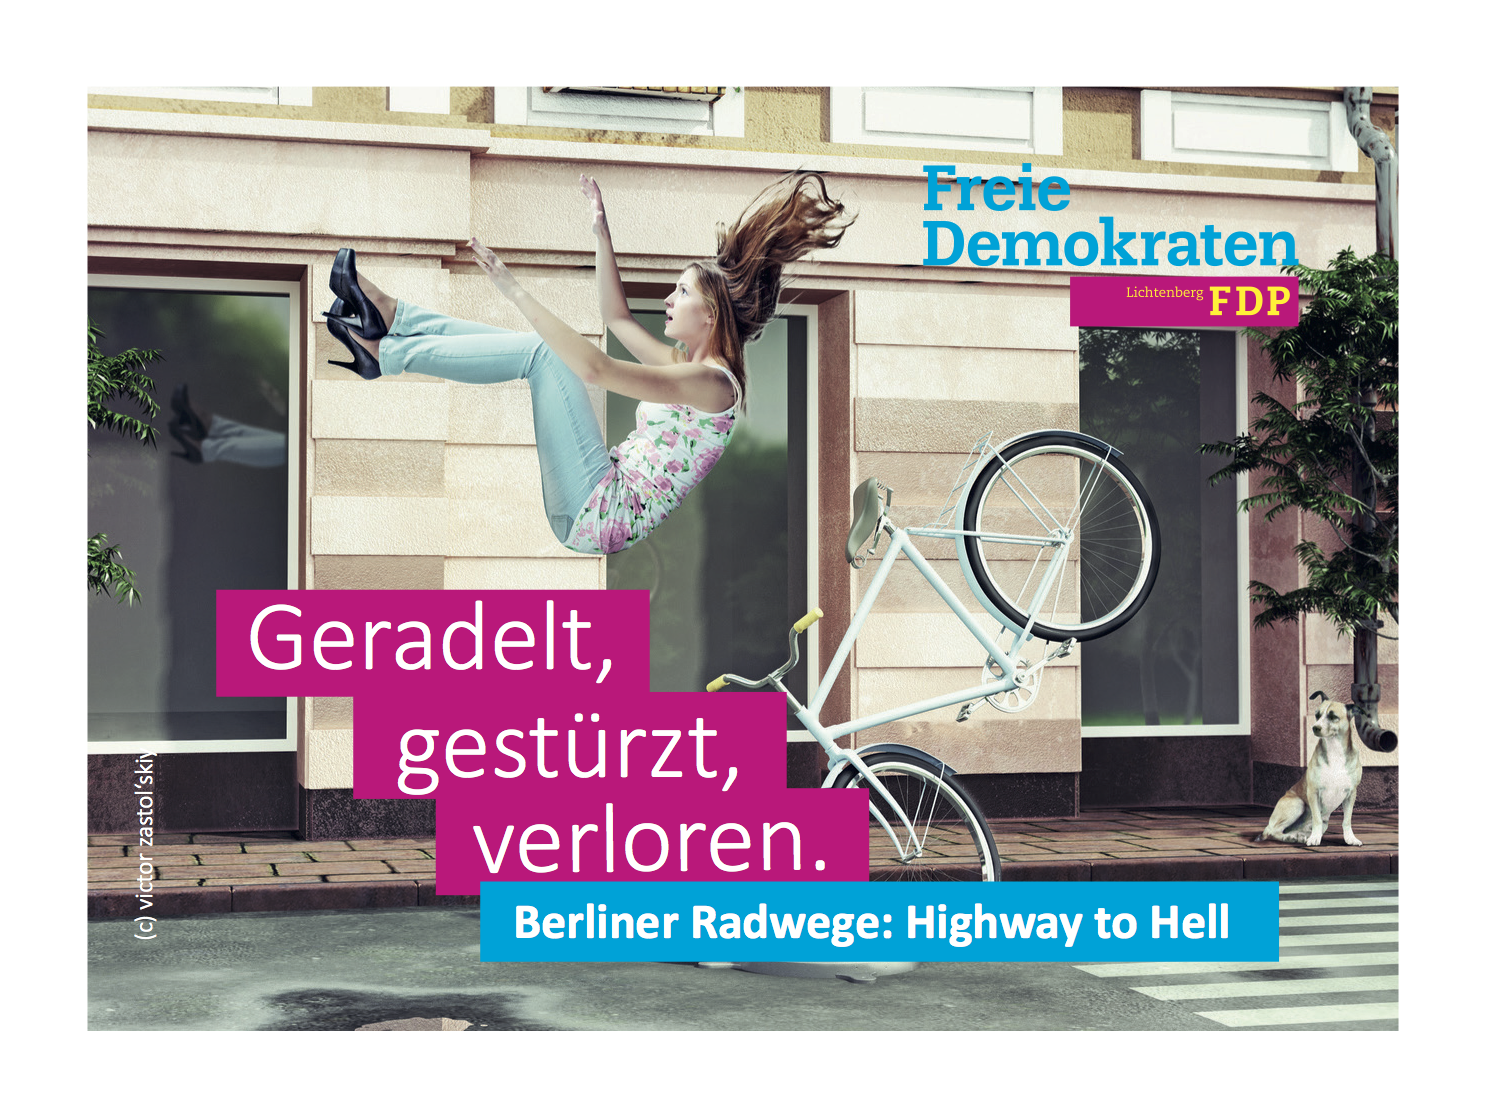 FDP Postkarte Radwege